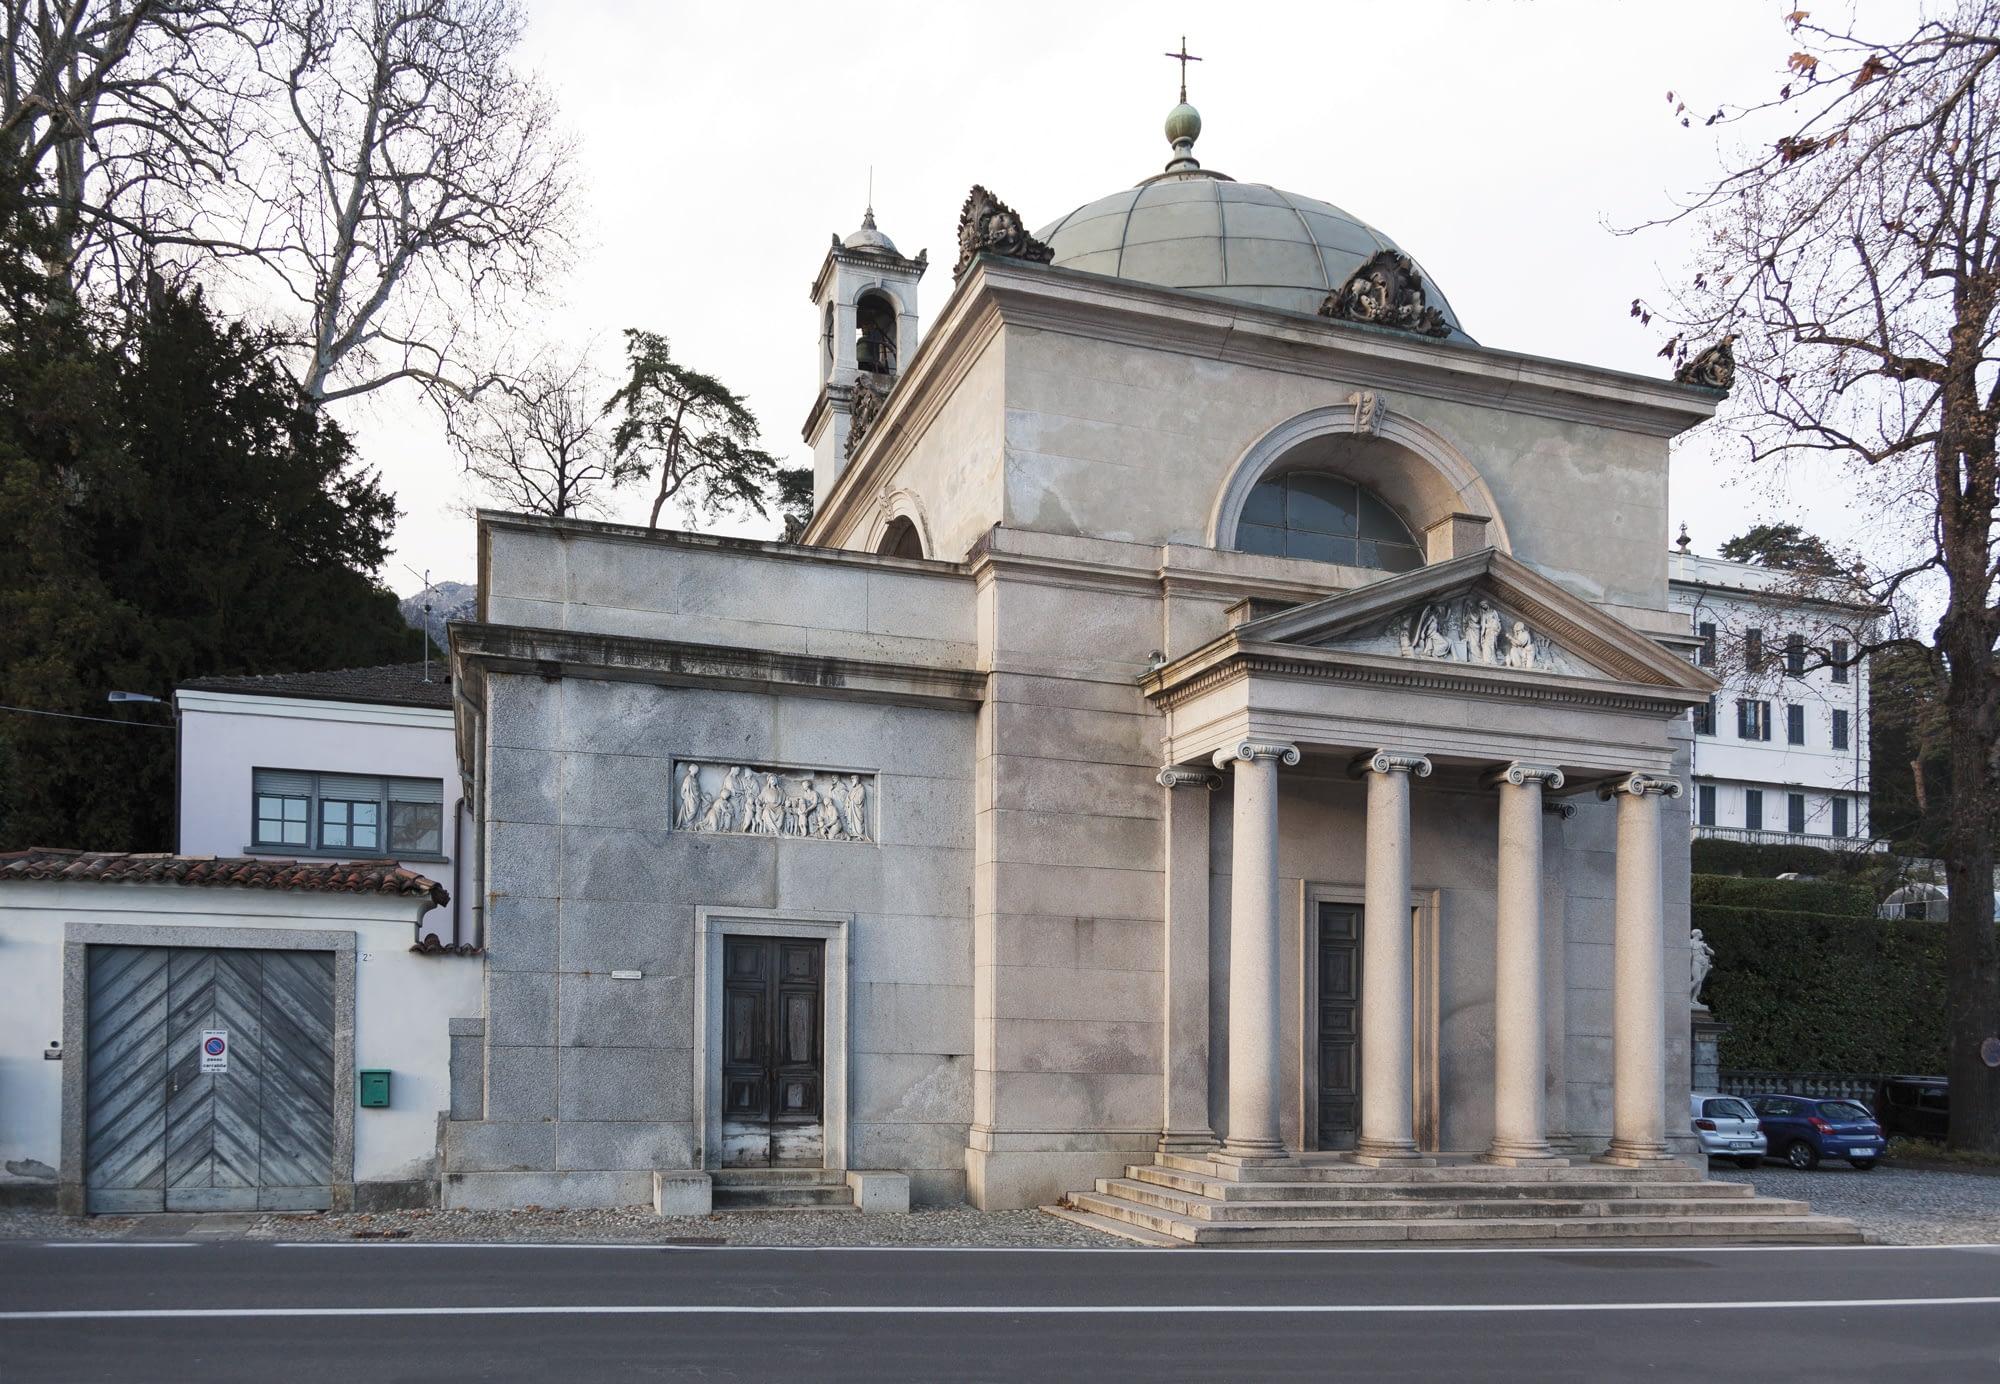 Oratorio Sommariva - Villa Carlotta